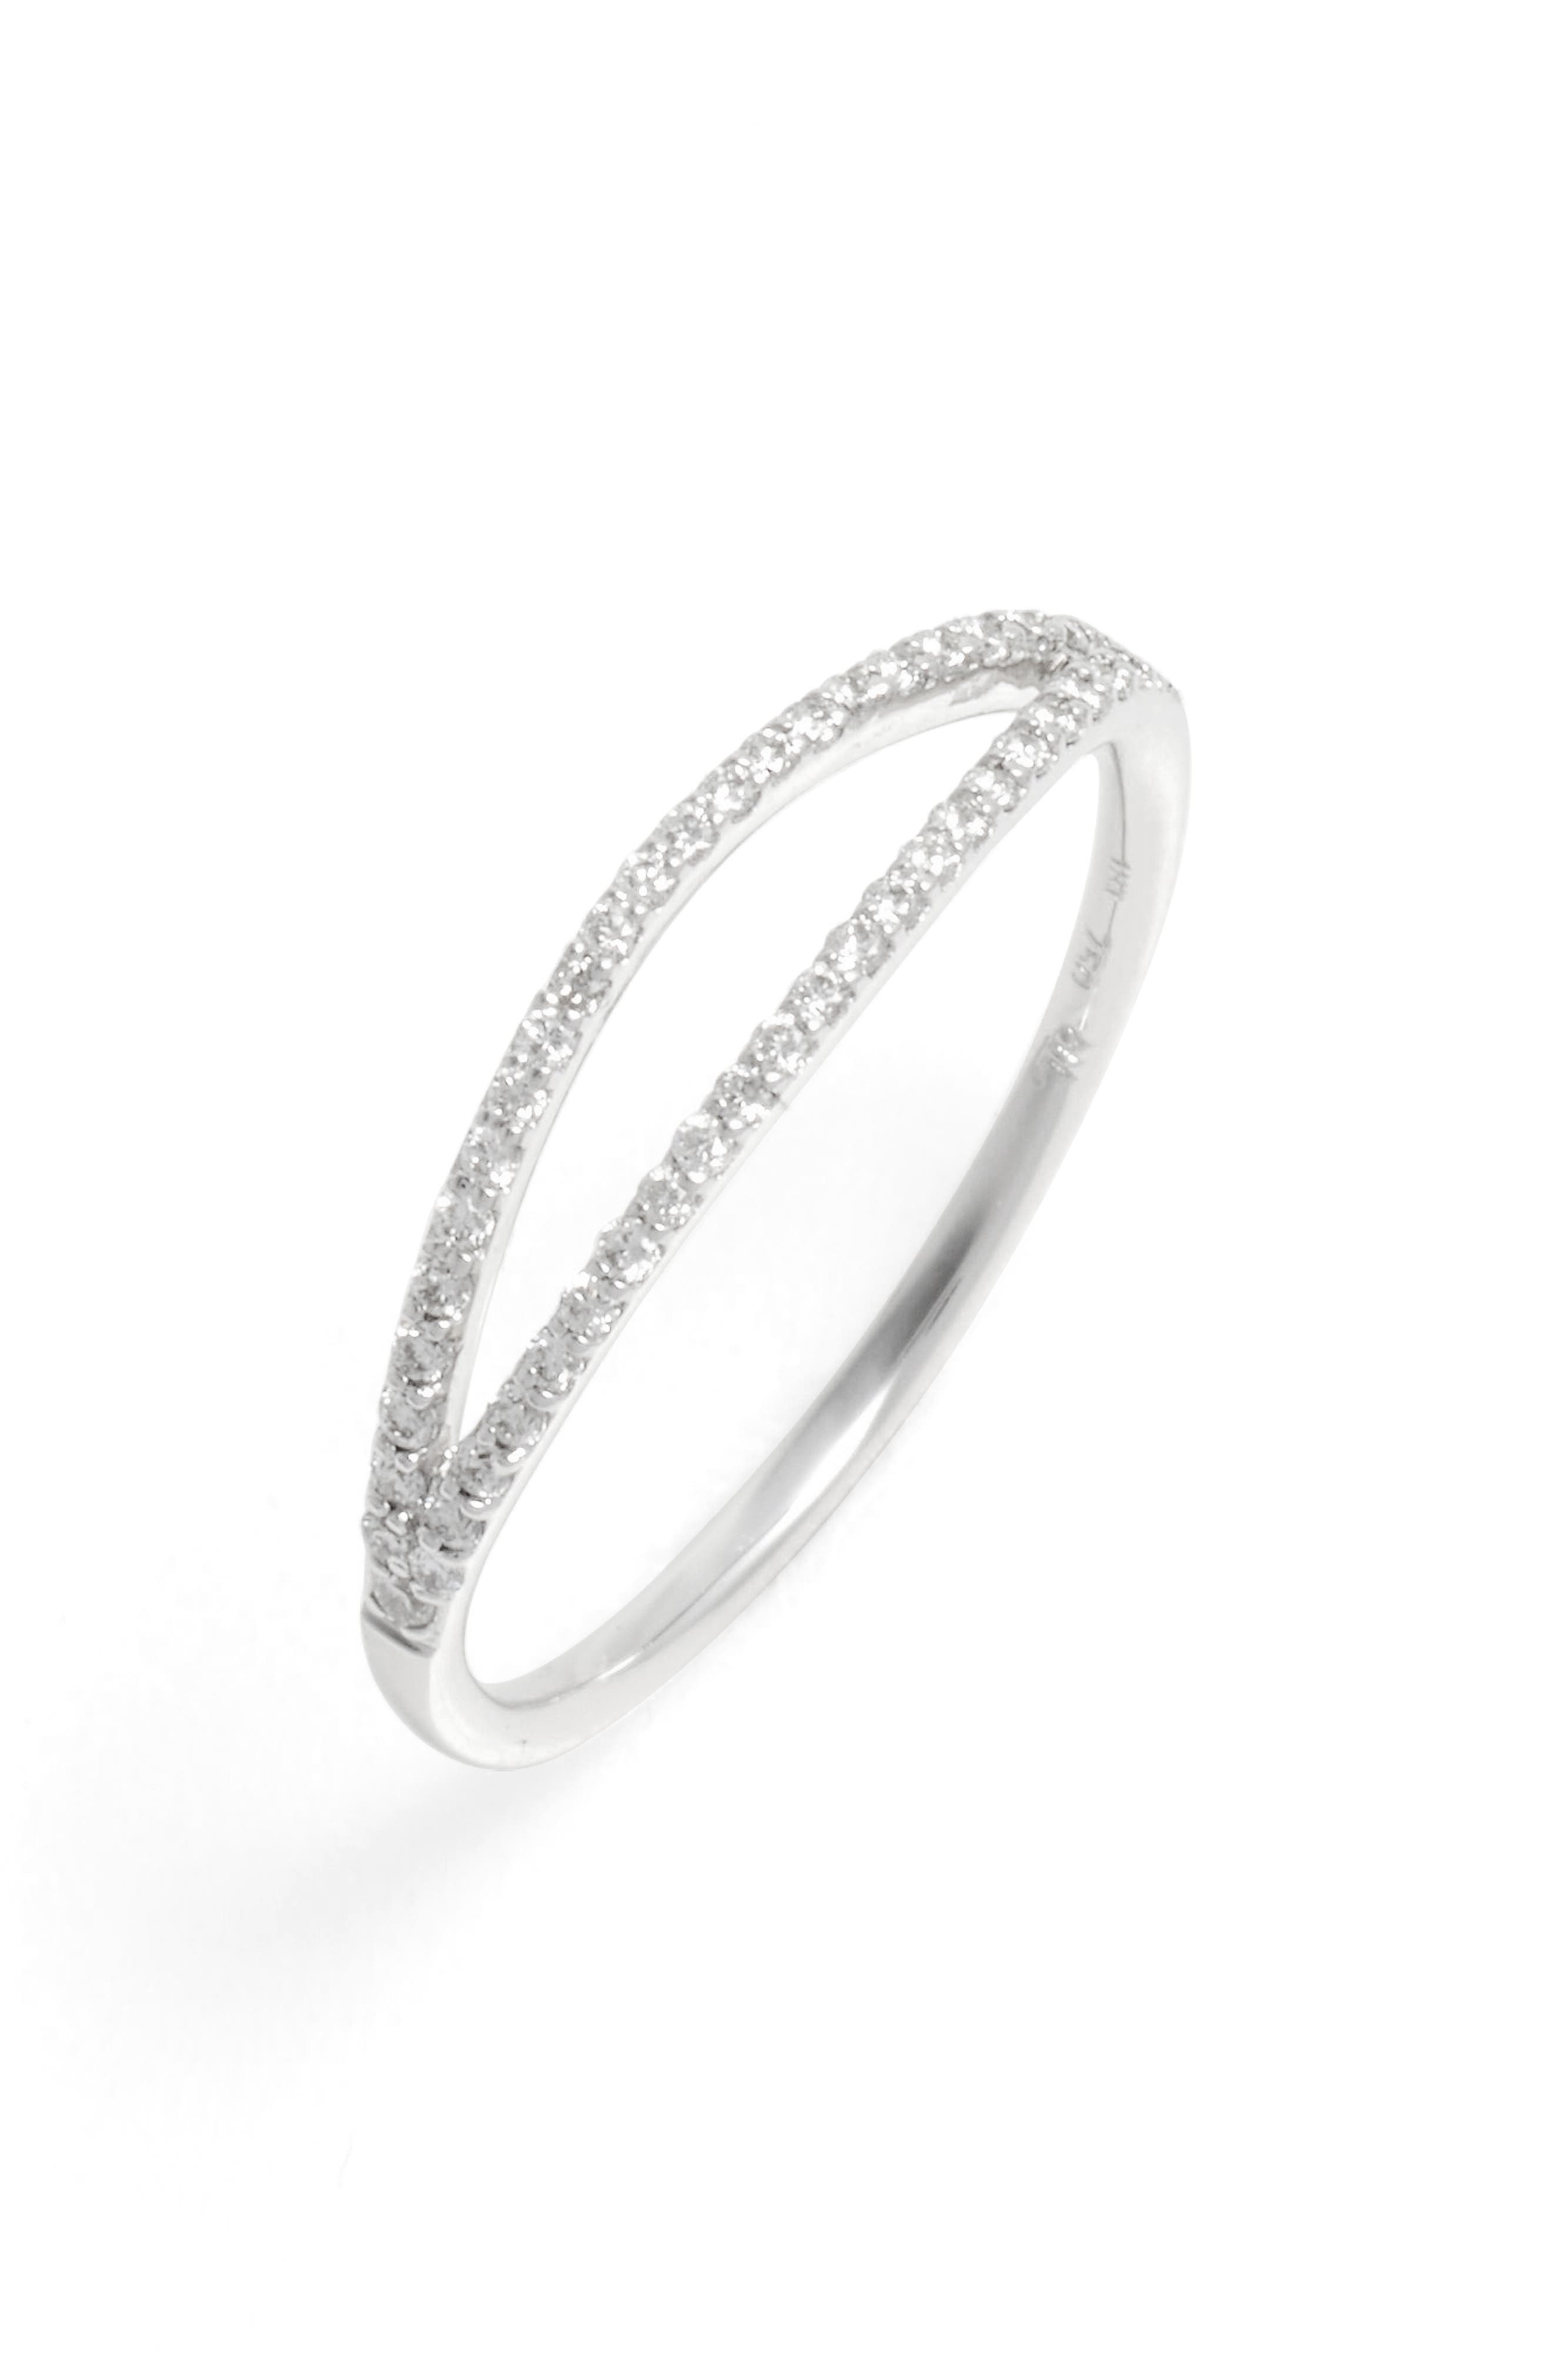 Kiera Two-Row Diamond Stack Ring,                         Main,                         color, White Gold